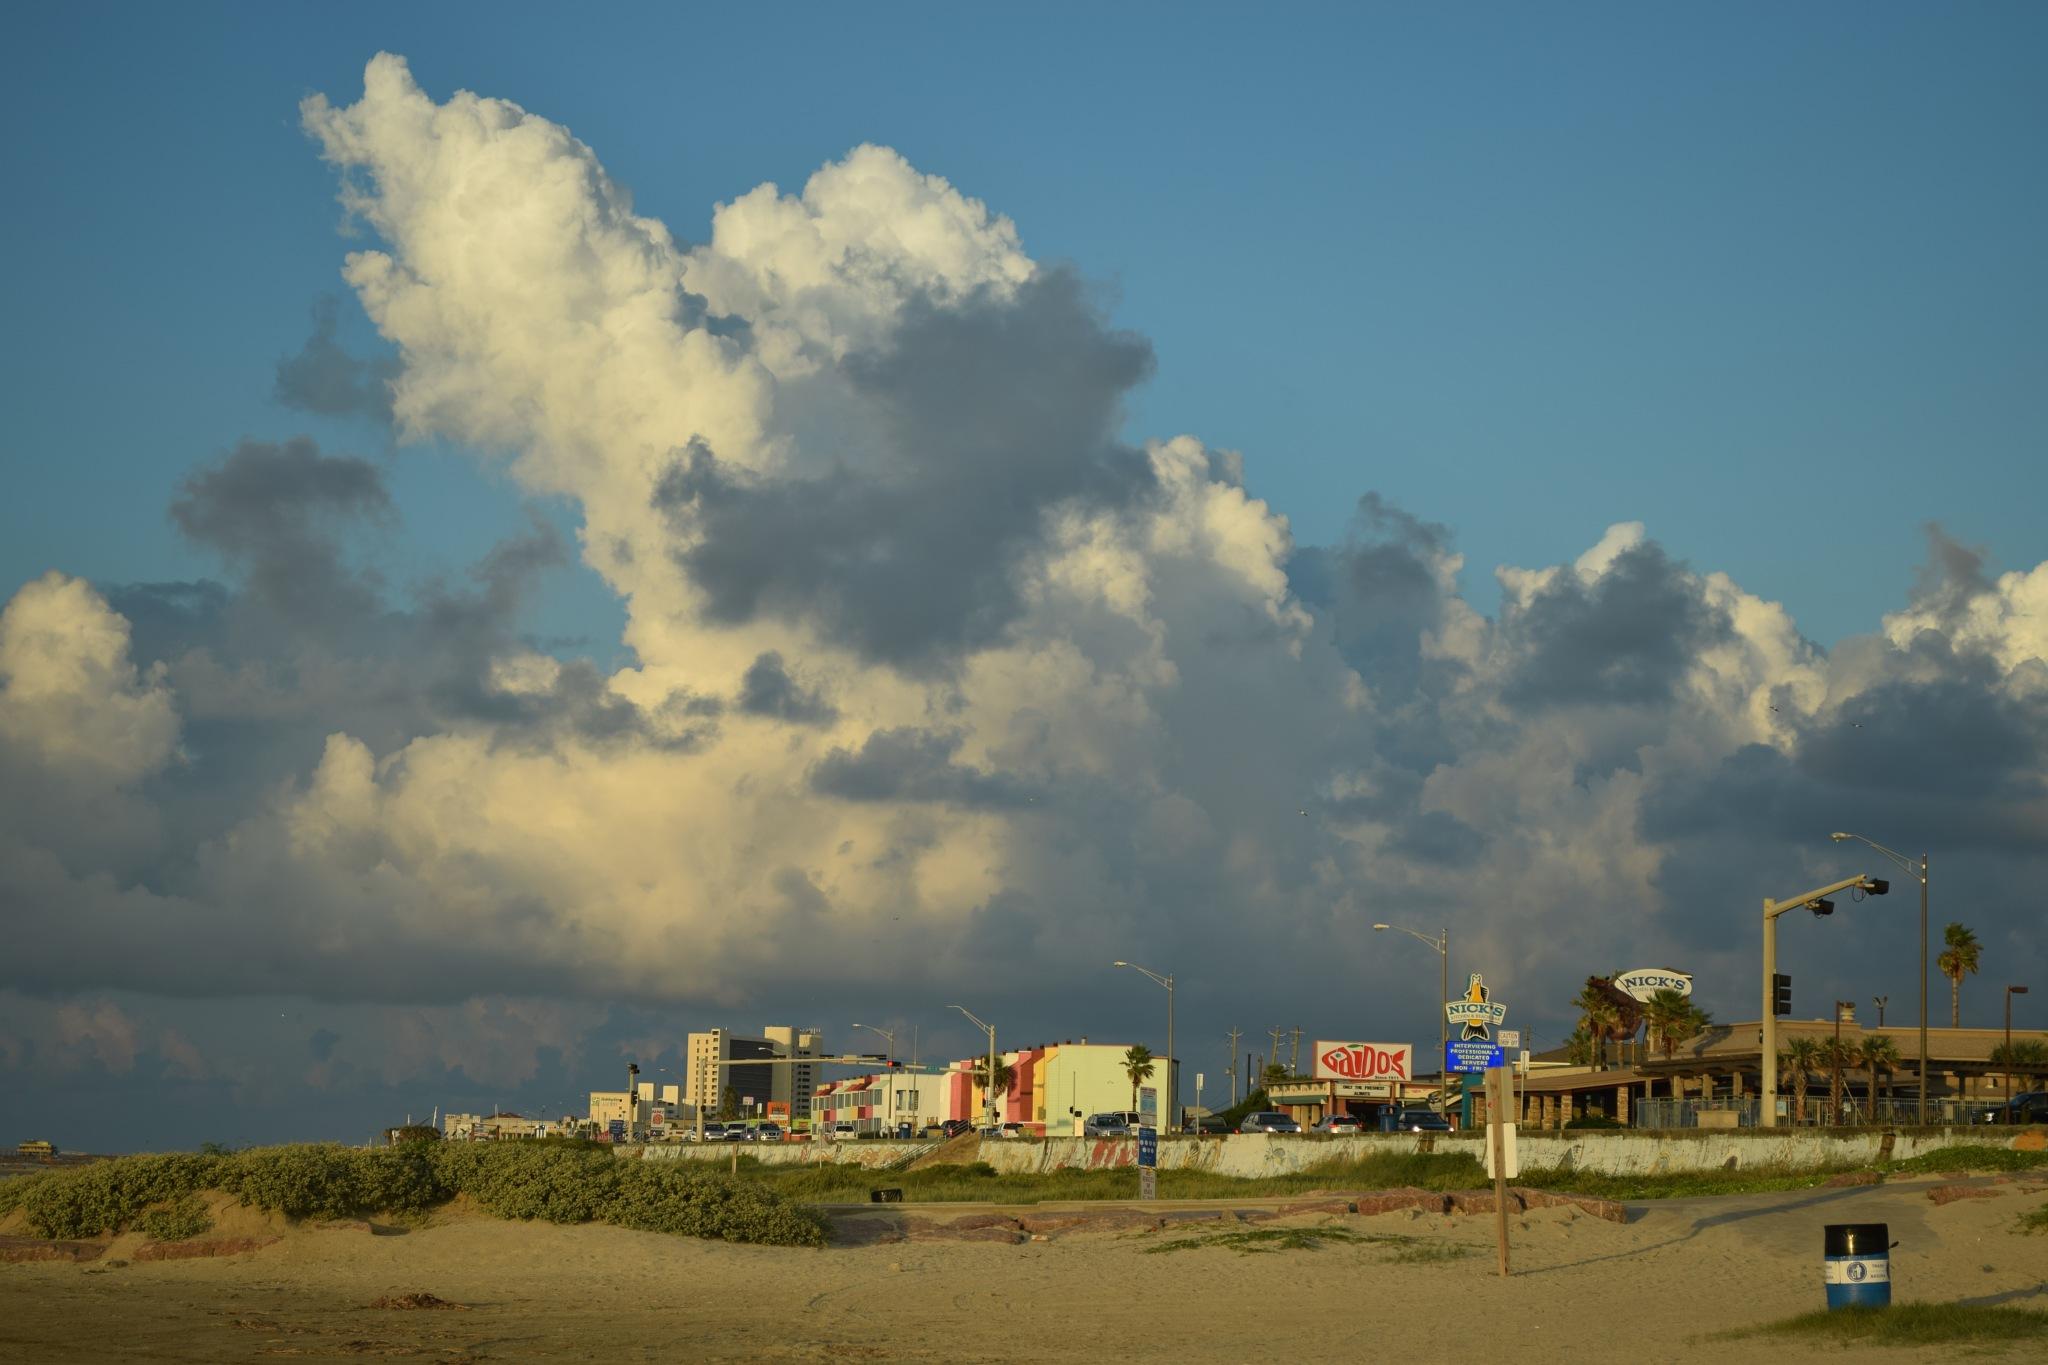 Galveston 242 by Lawrence Scott Hess